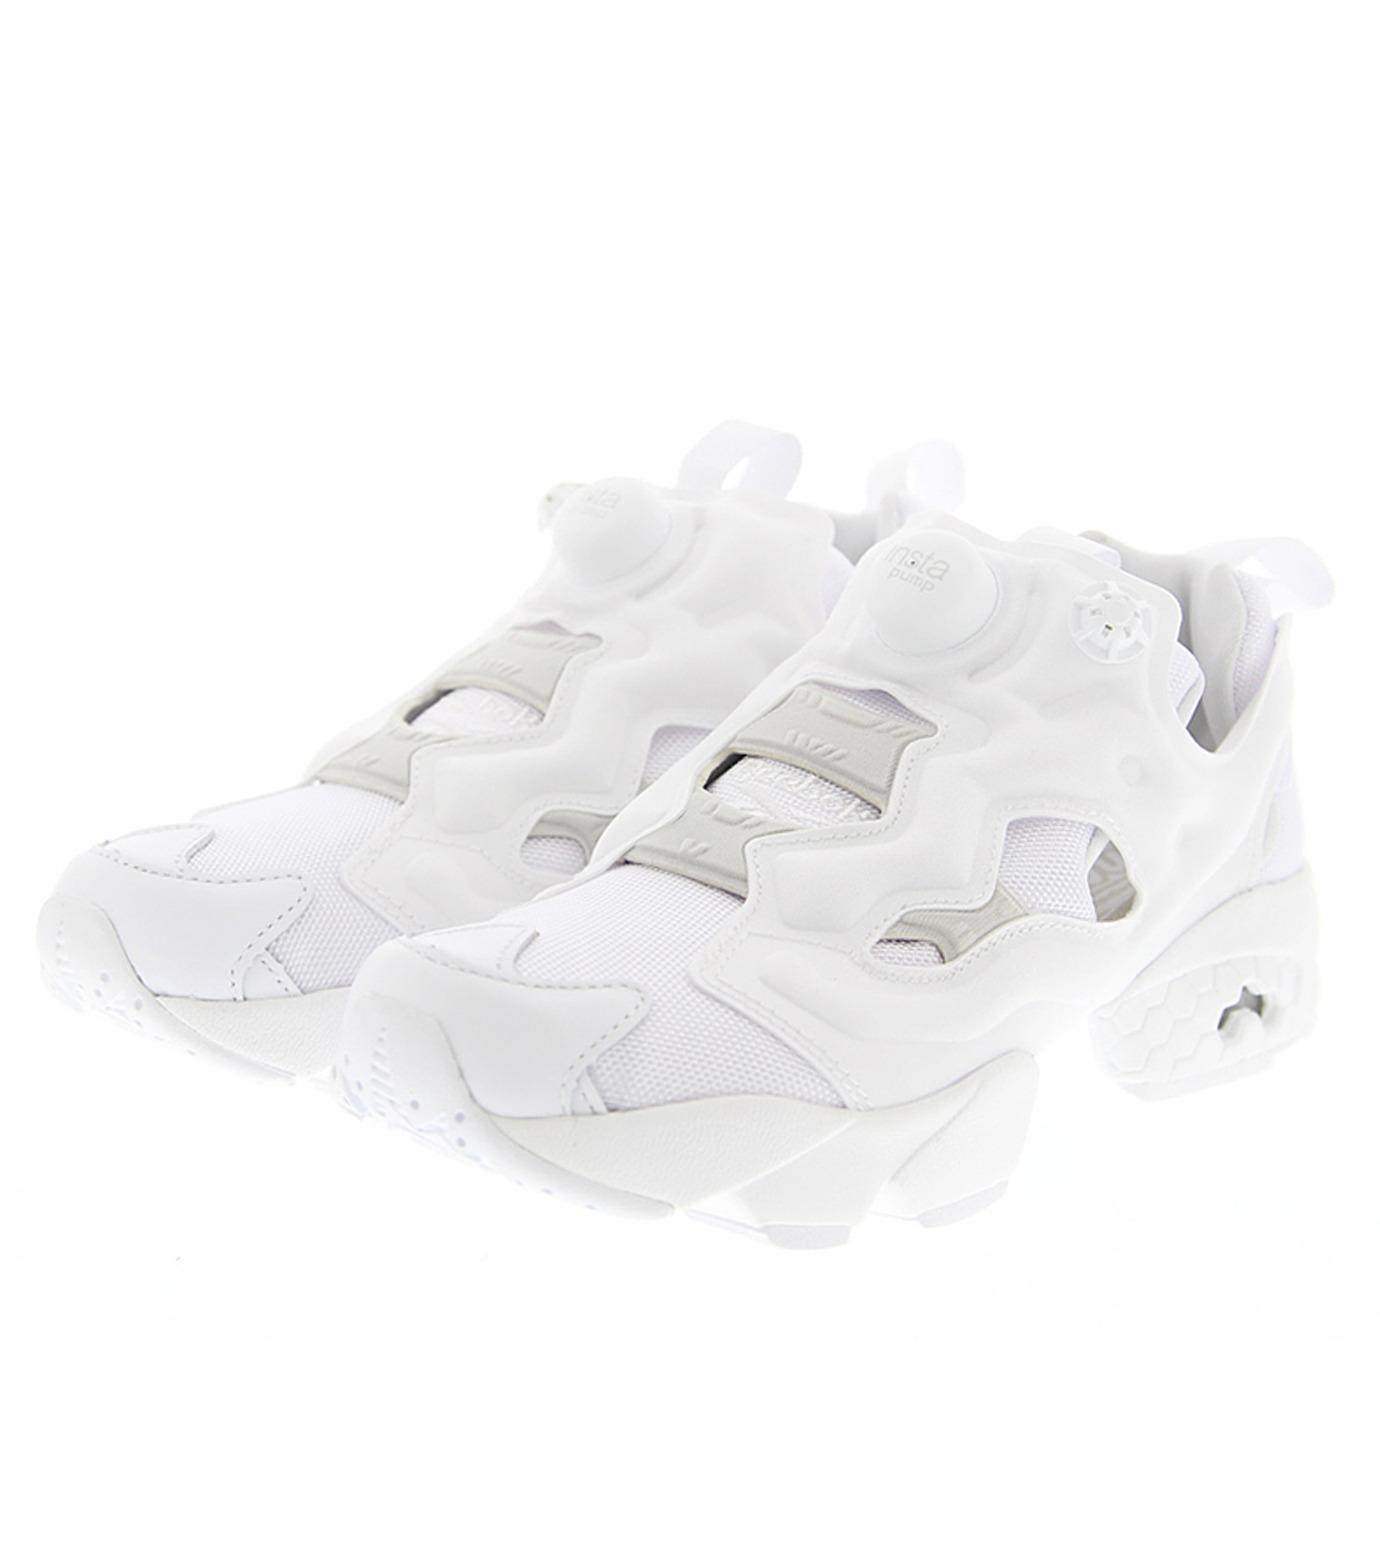 Reebok(リーボック)のINSTAPUMP FURY OG-WHITE(シューズ/shoes)-AR2199-4 拡大詳細画像3